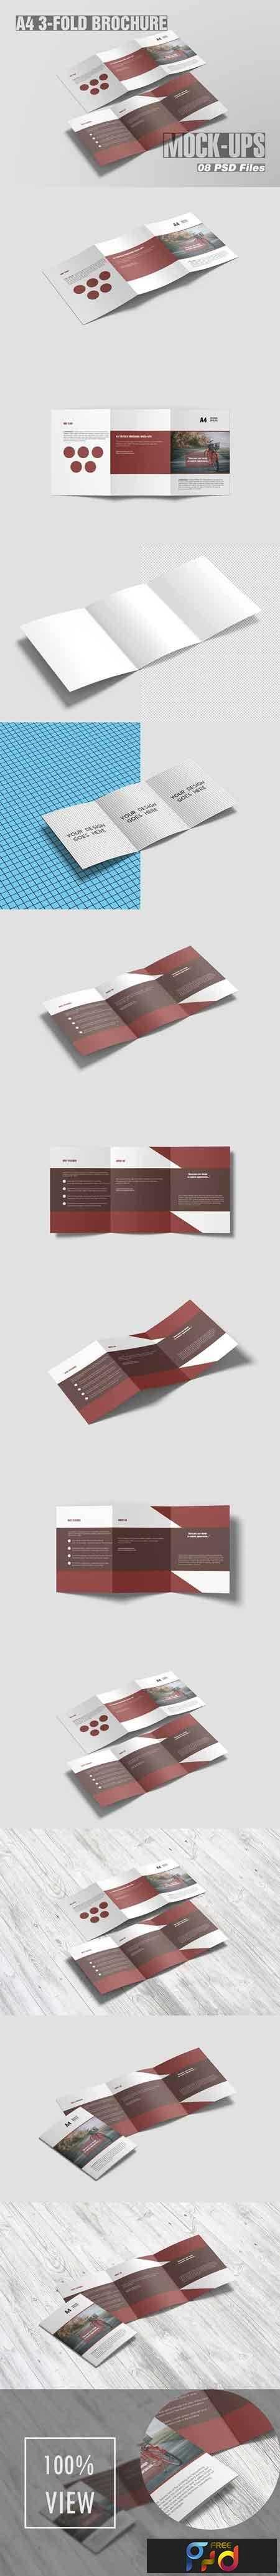 1807056 A4 Trifold Brochure Mockup 2555732 1